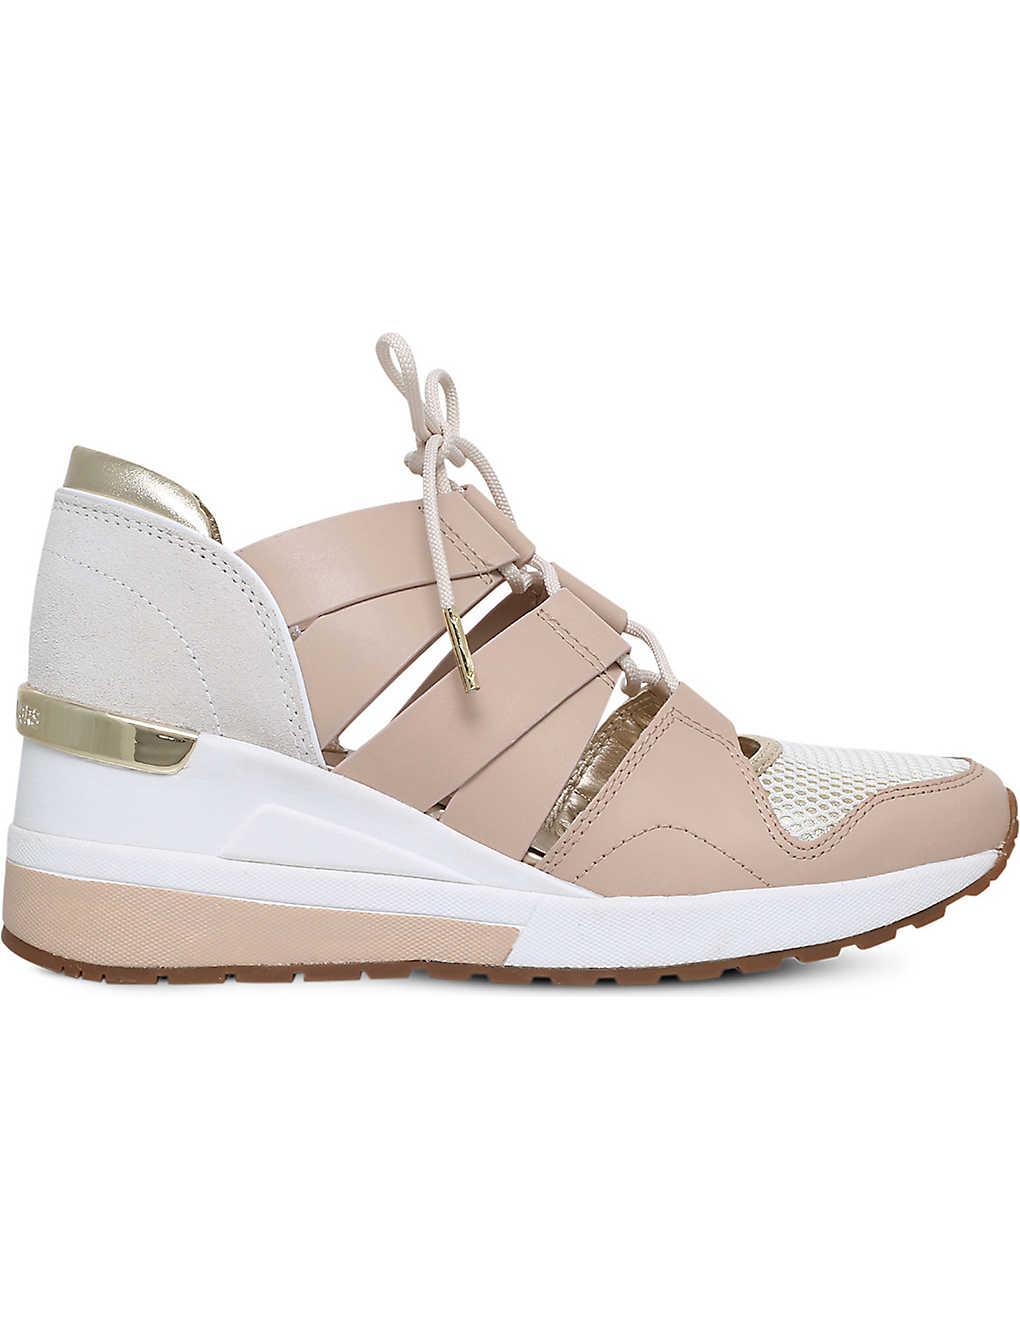 067918523ac3 MICHAEL MICHAEL KORS - Beckett cut-out leather trainers | Selfridges.com